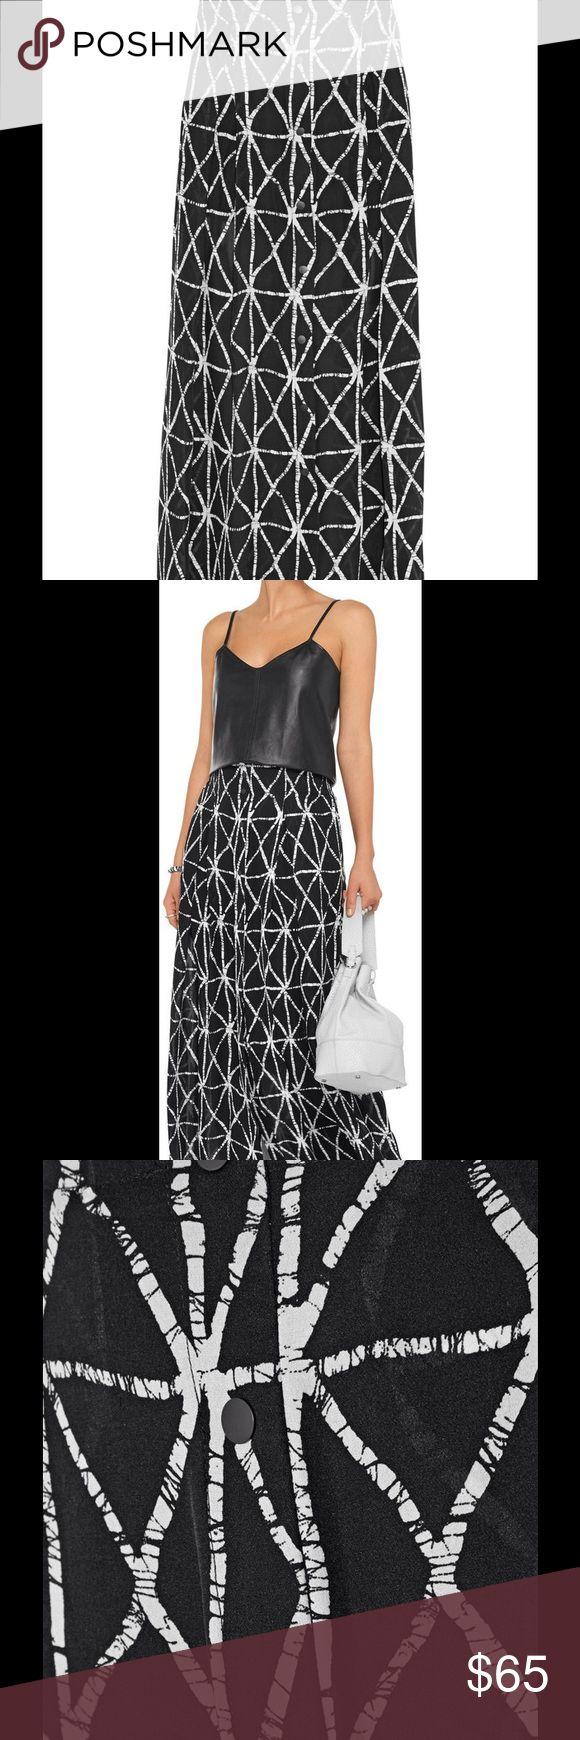 A.L.C. Jacob Silk Maxi Skirt New ALC Black and white maxi skirt with elasticized waist, pleats, dual seam pockets at side, size 6, 100% silk. Waist approx.32, Hip approx. 47, Length approx. 44 A.L.C. Skirts Maxi